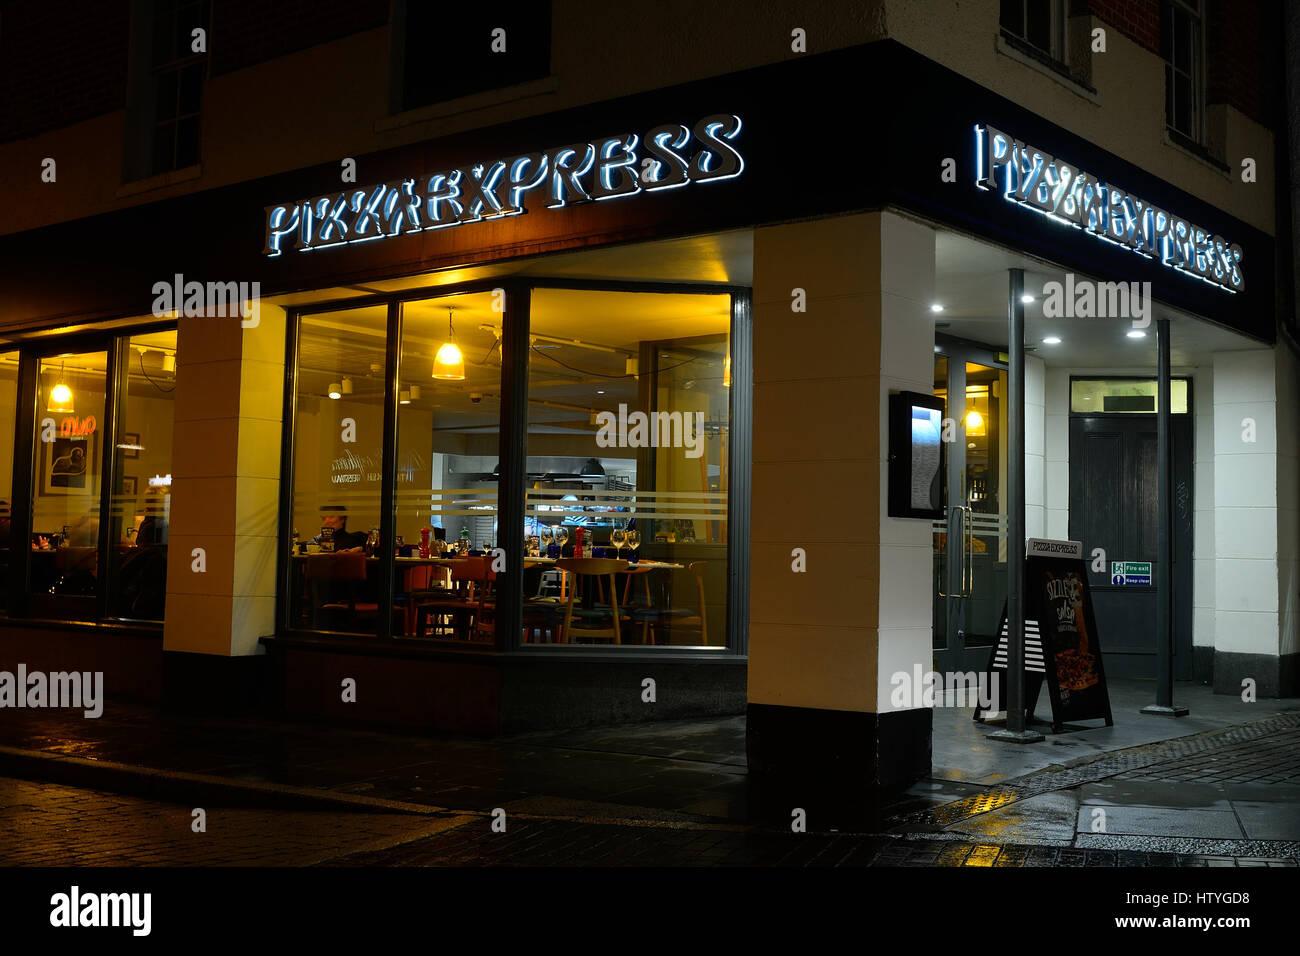 Pizza Express Restuarant In Hitchin Hertfordshire Stock